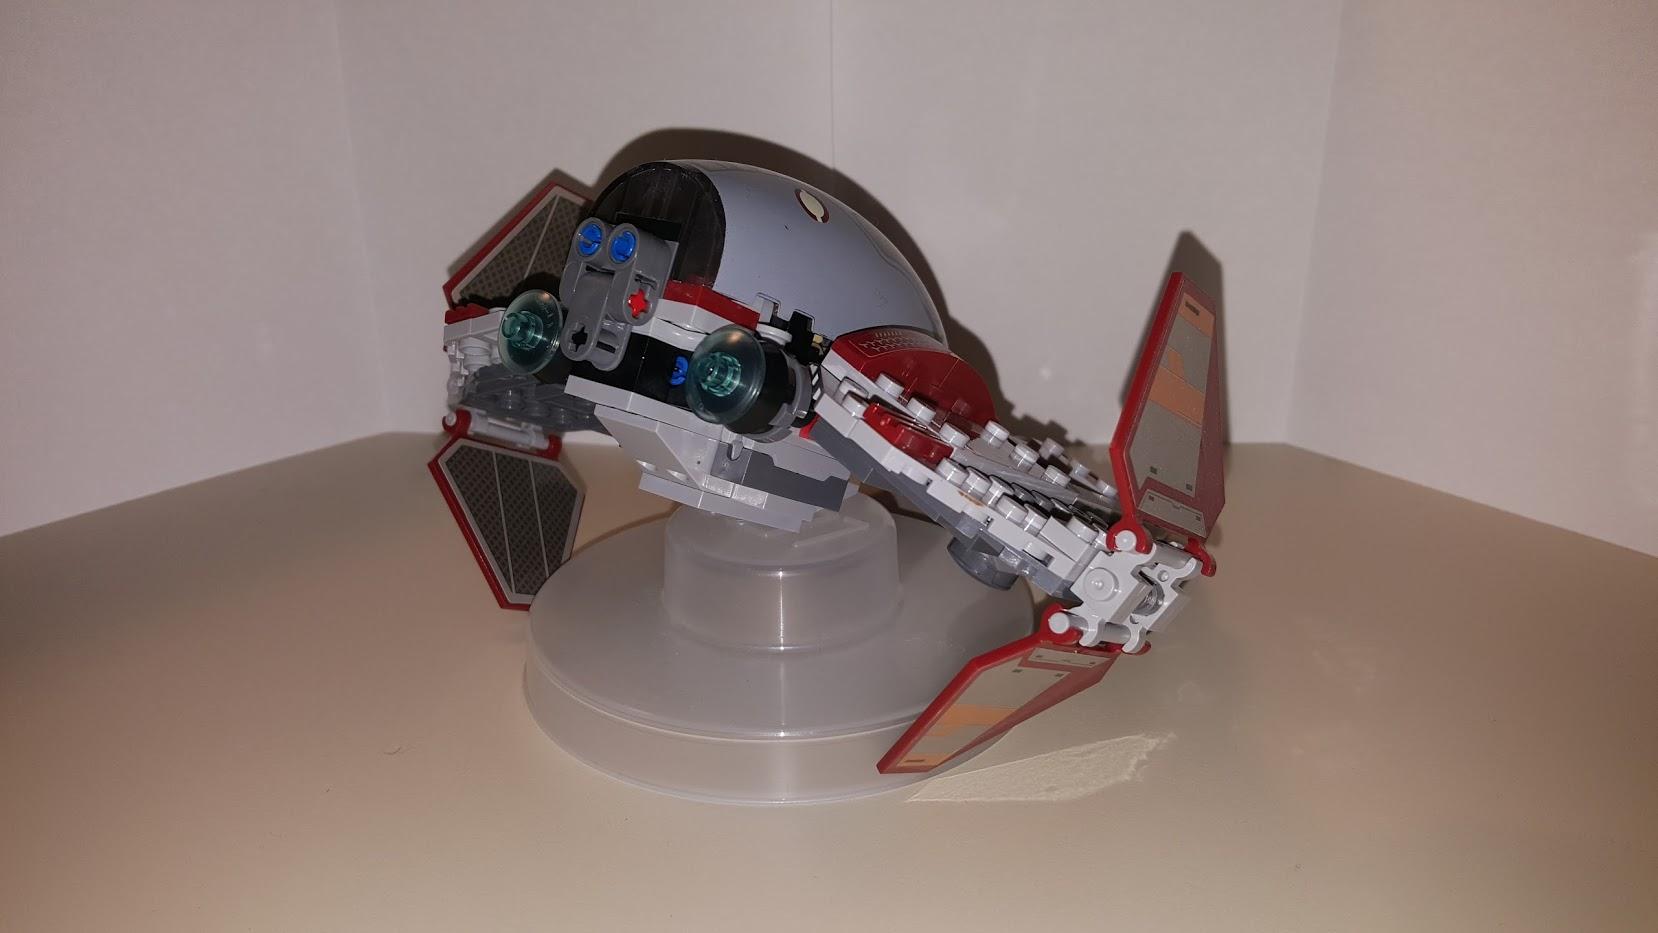 Review LEPIN 05020 - Obi-Wan's Jedi Interceptor 3